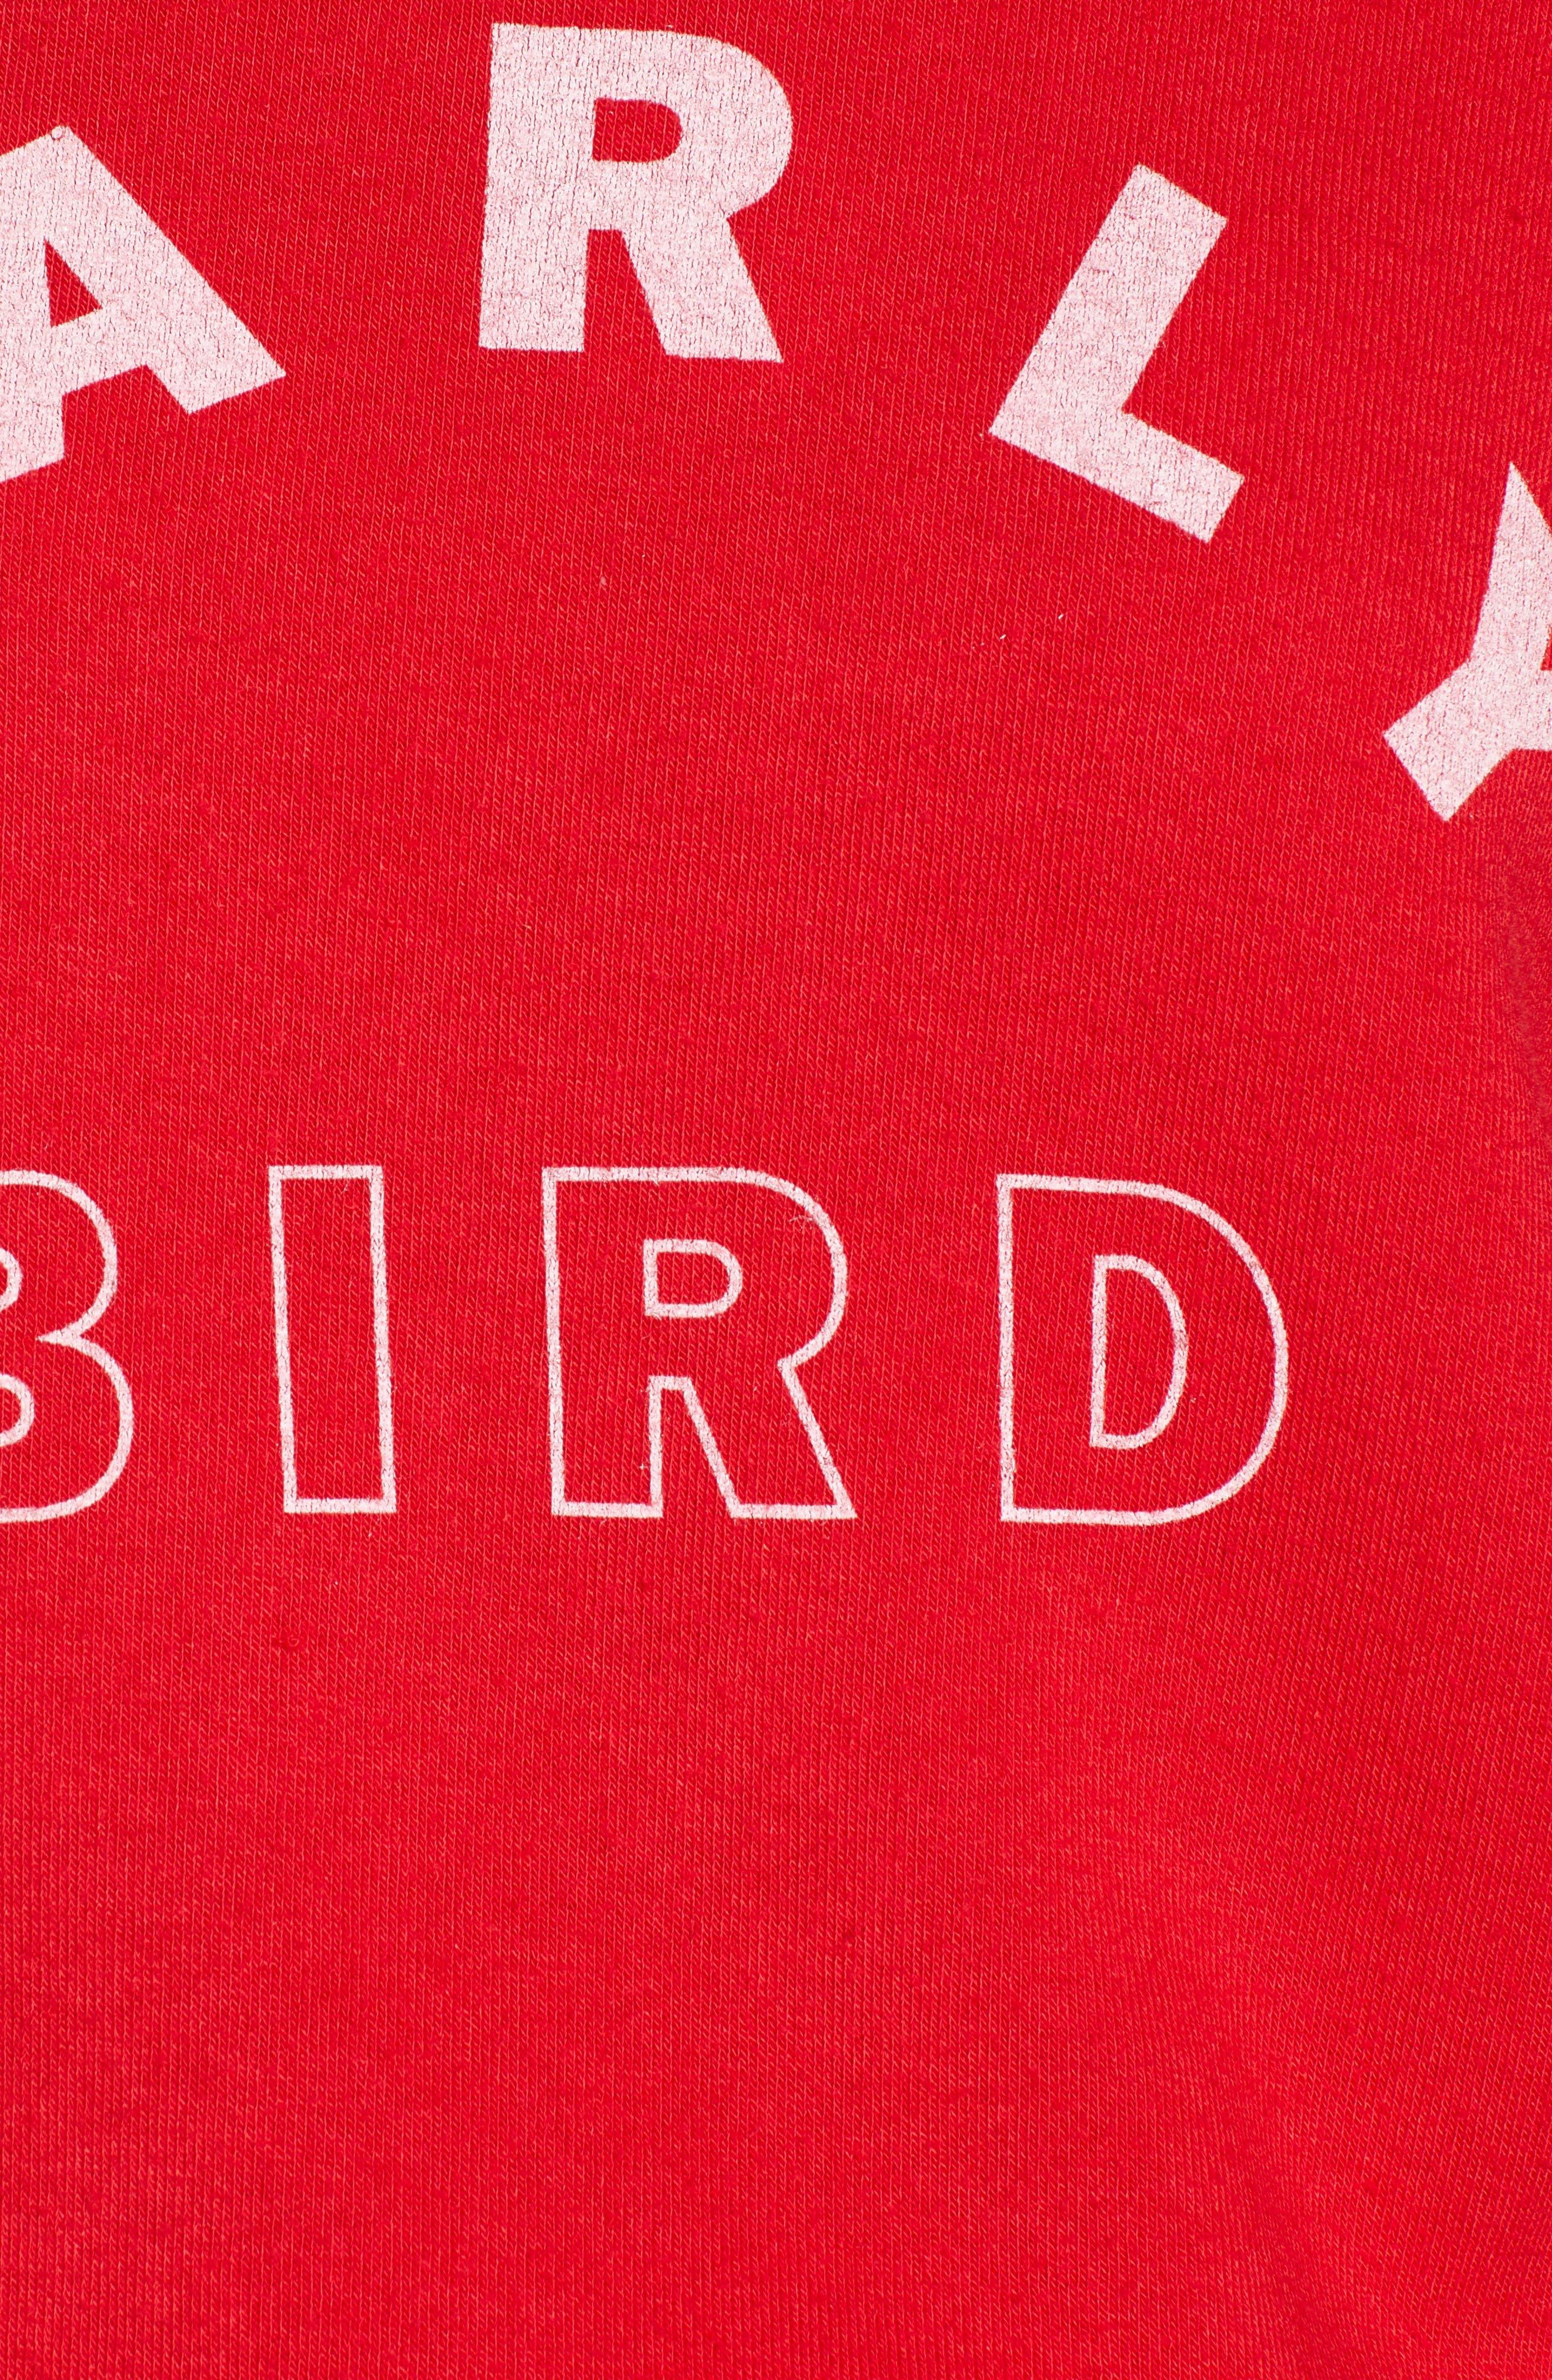 Reversible Sweatshirt,                             Alternate thumbnail 7, color,                             Red